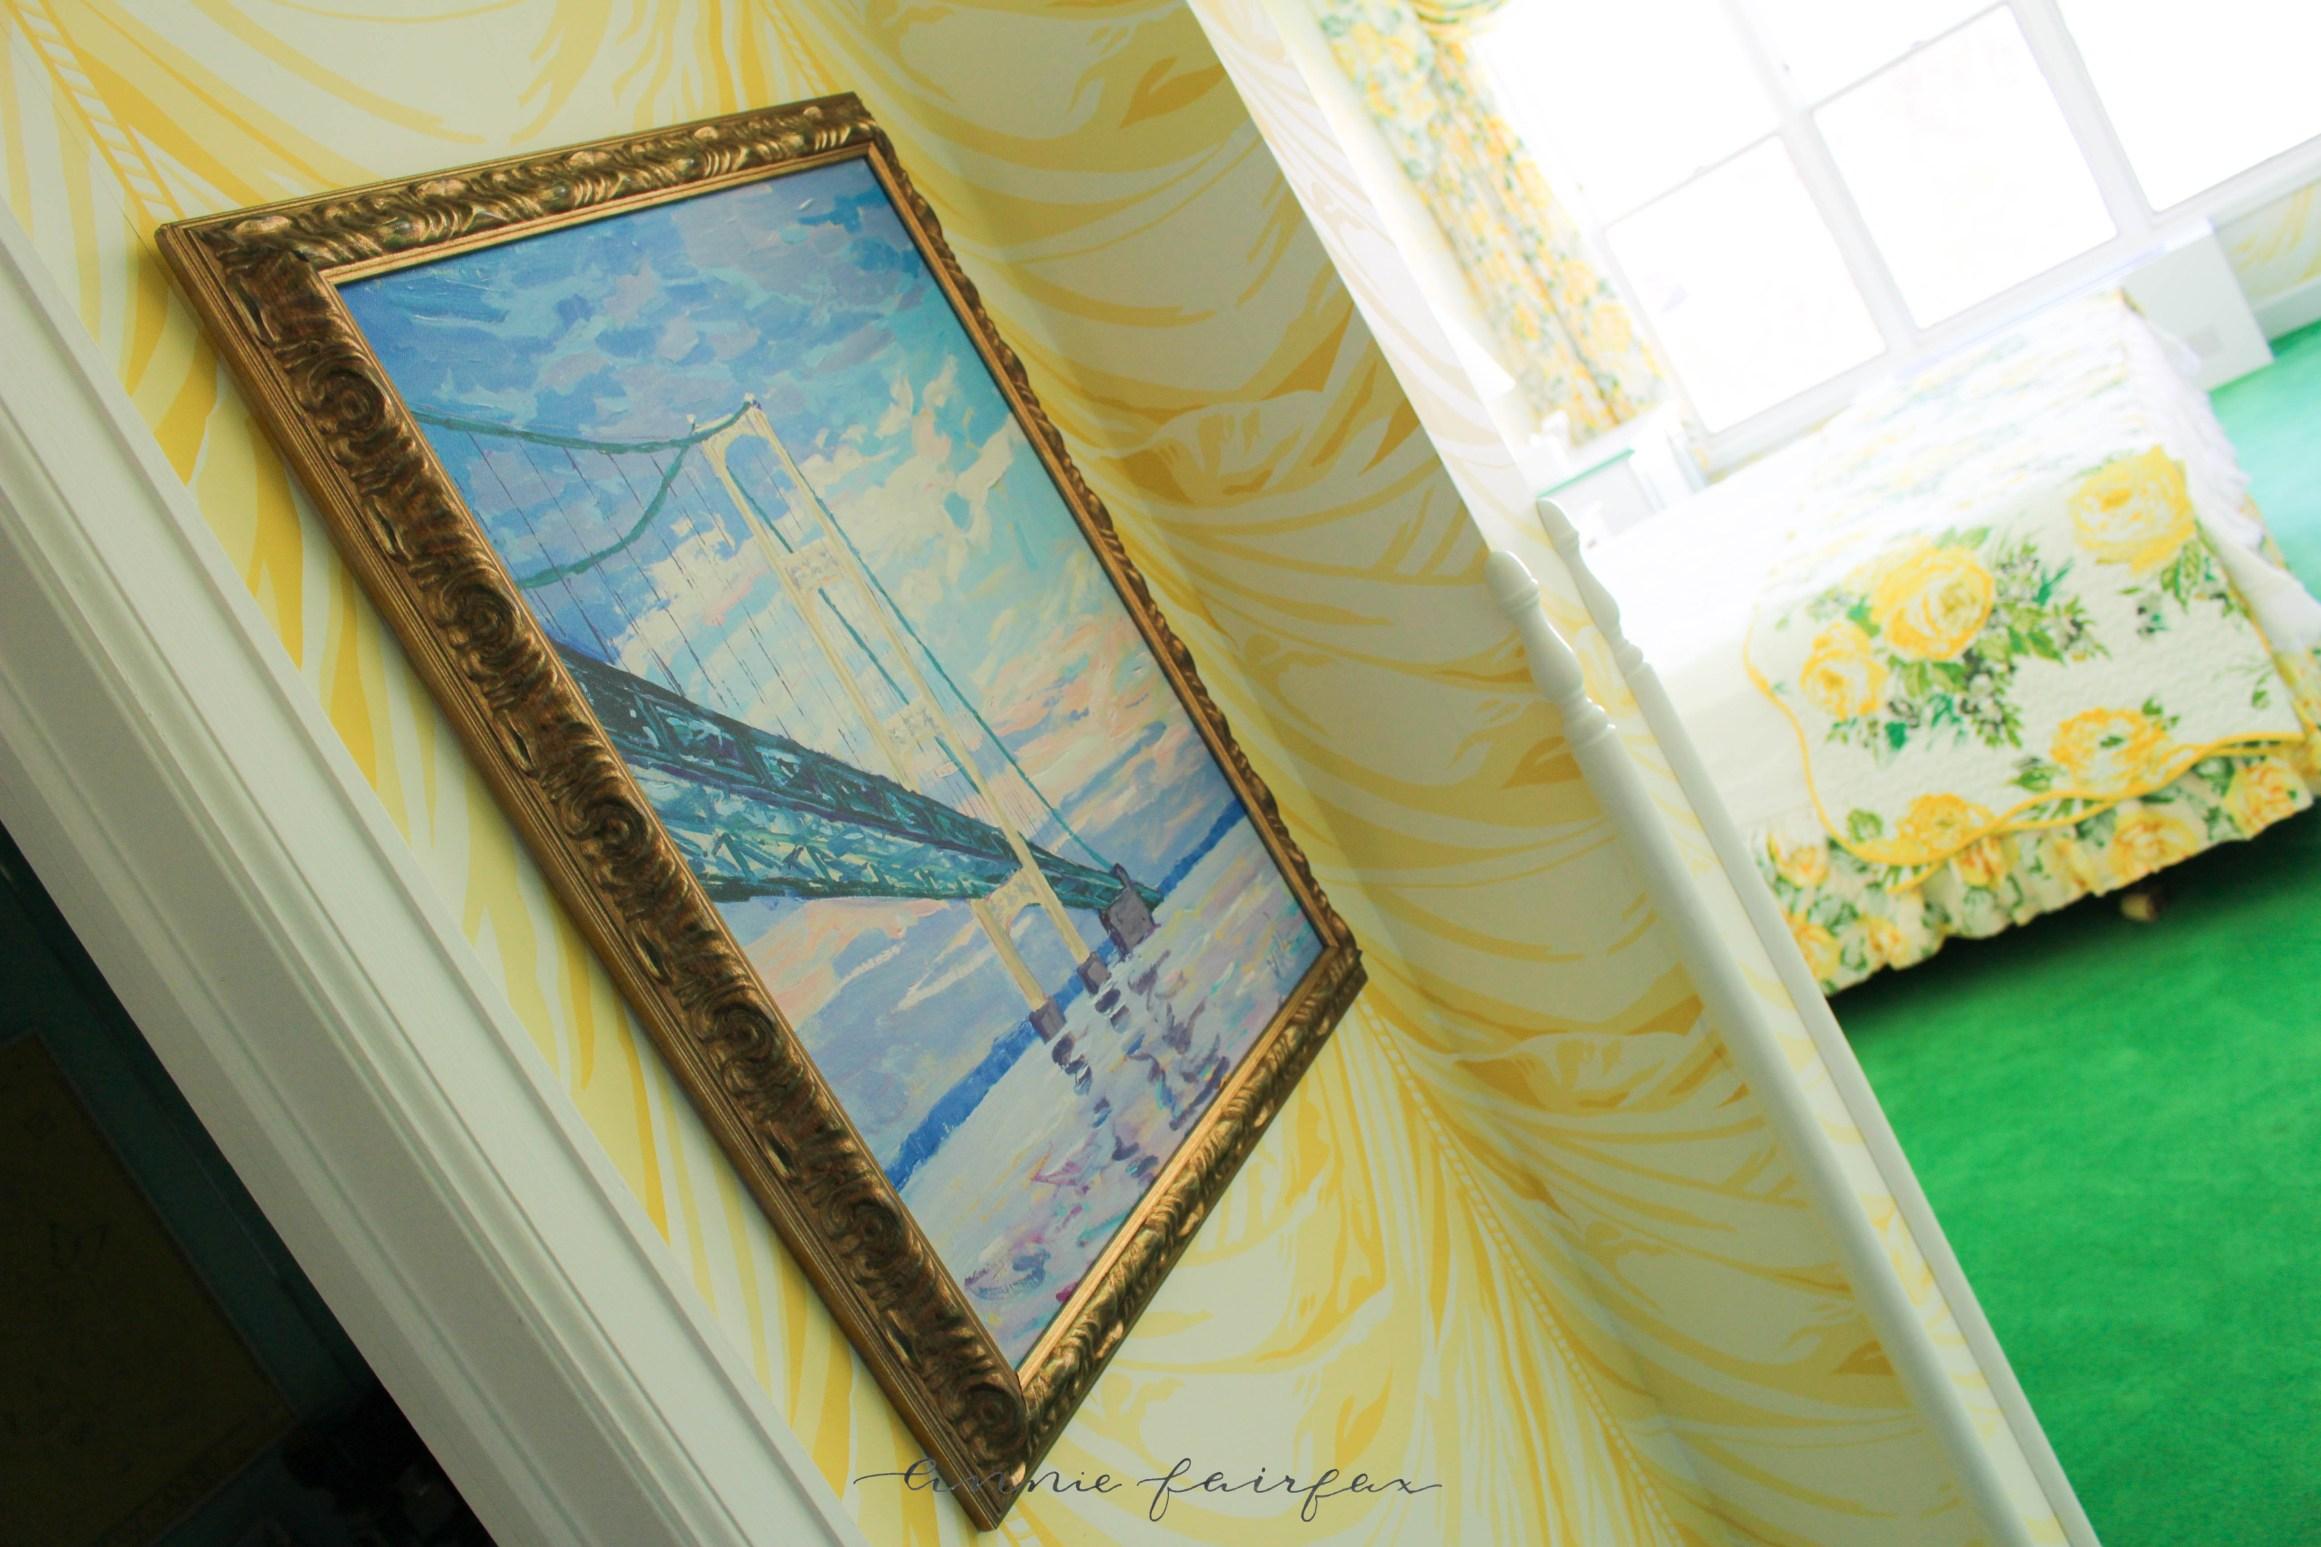 Grand Hotel by Annie Fairfax